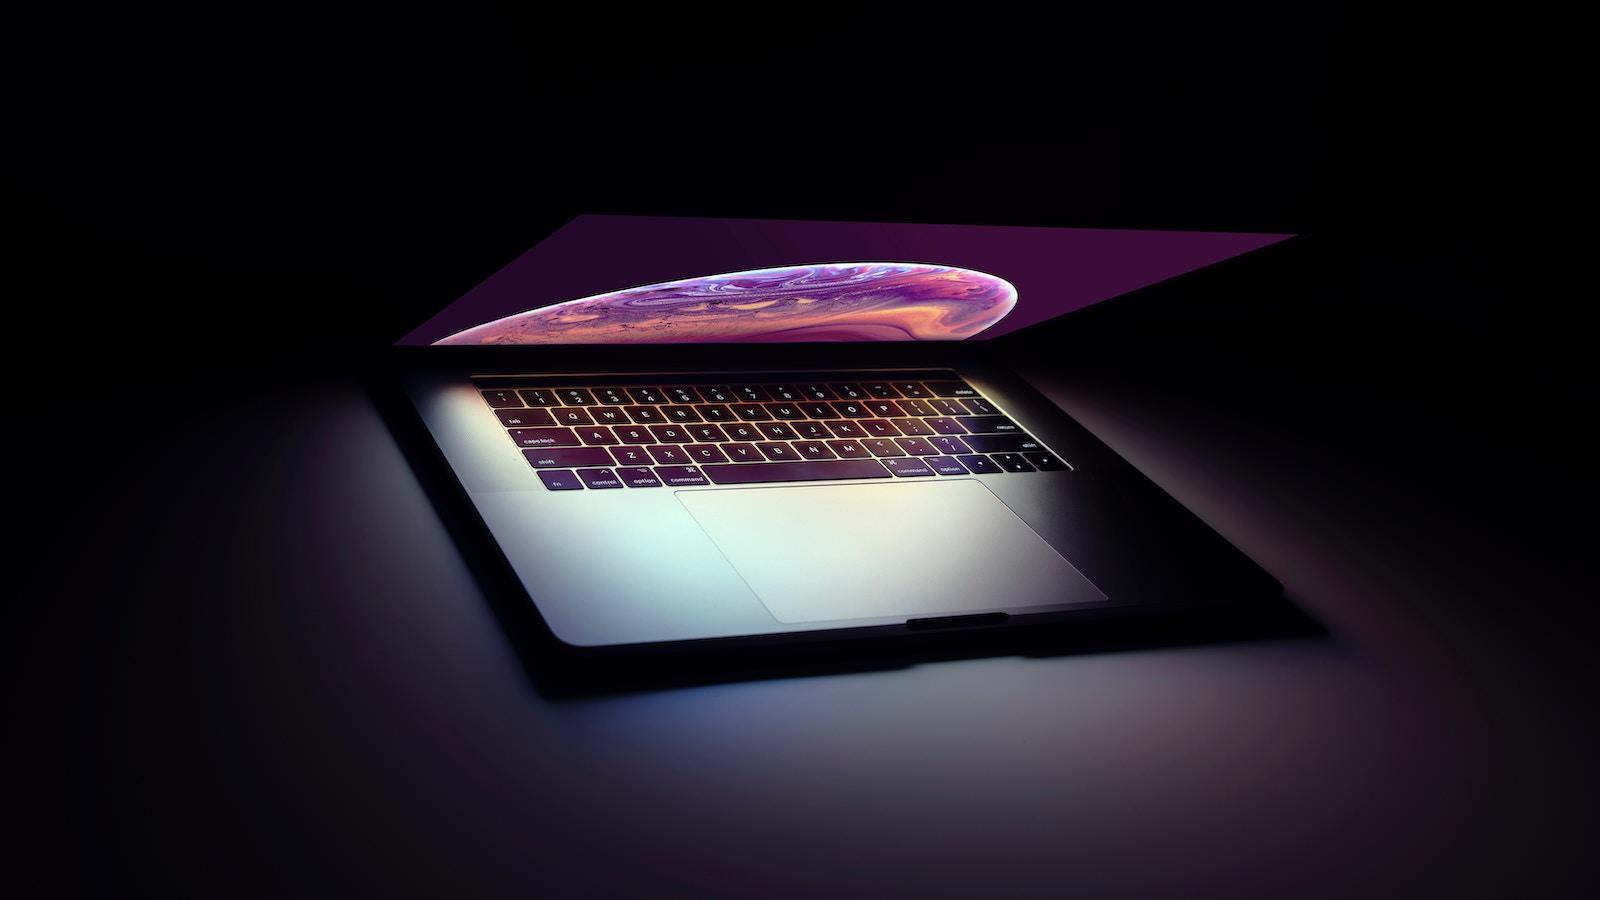 Leap design 1044910 unsplash macbook pro